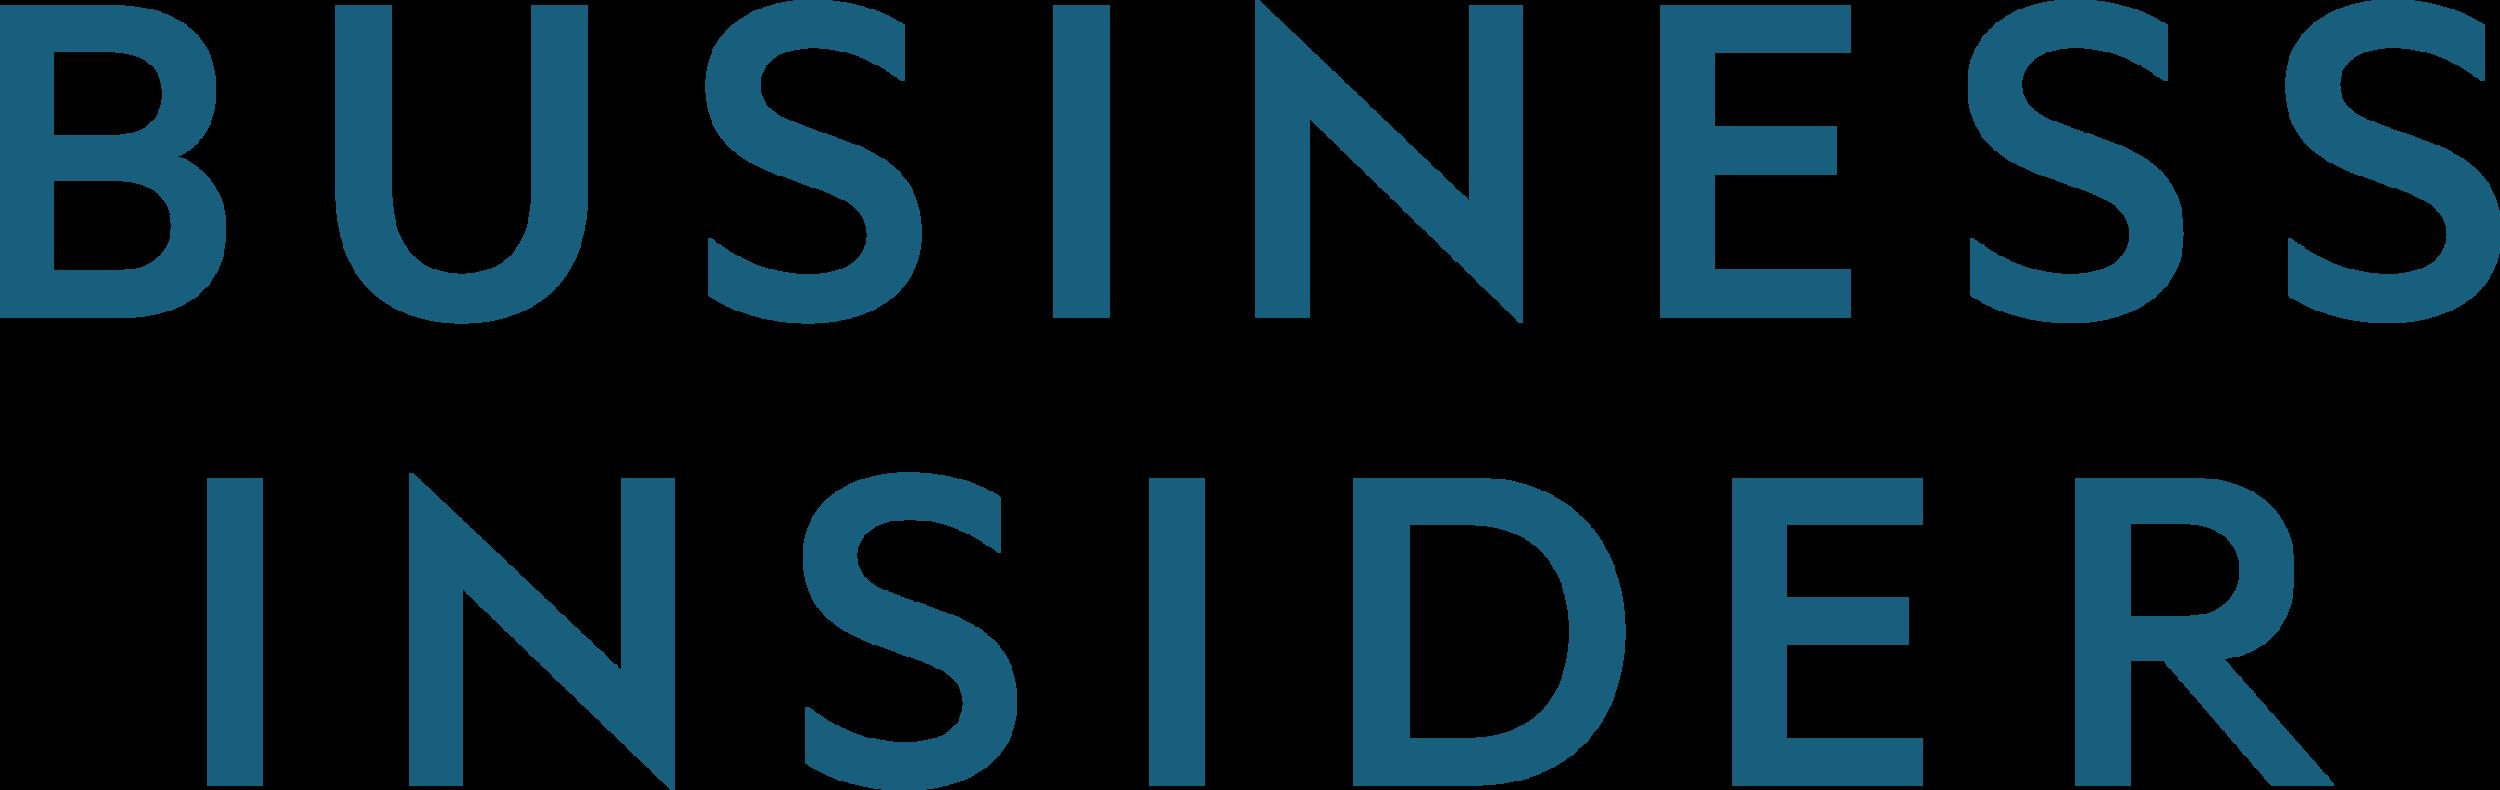 business-insider-logos-copy.png